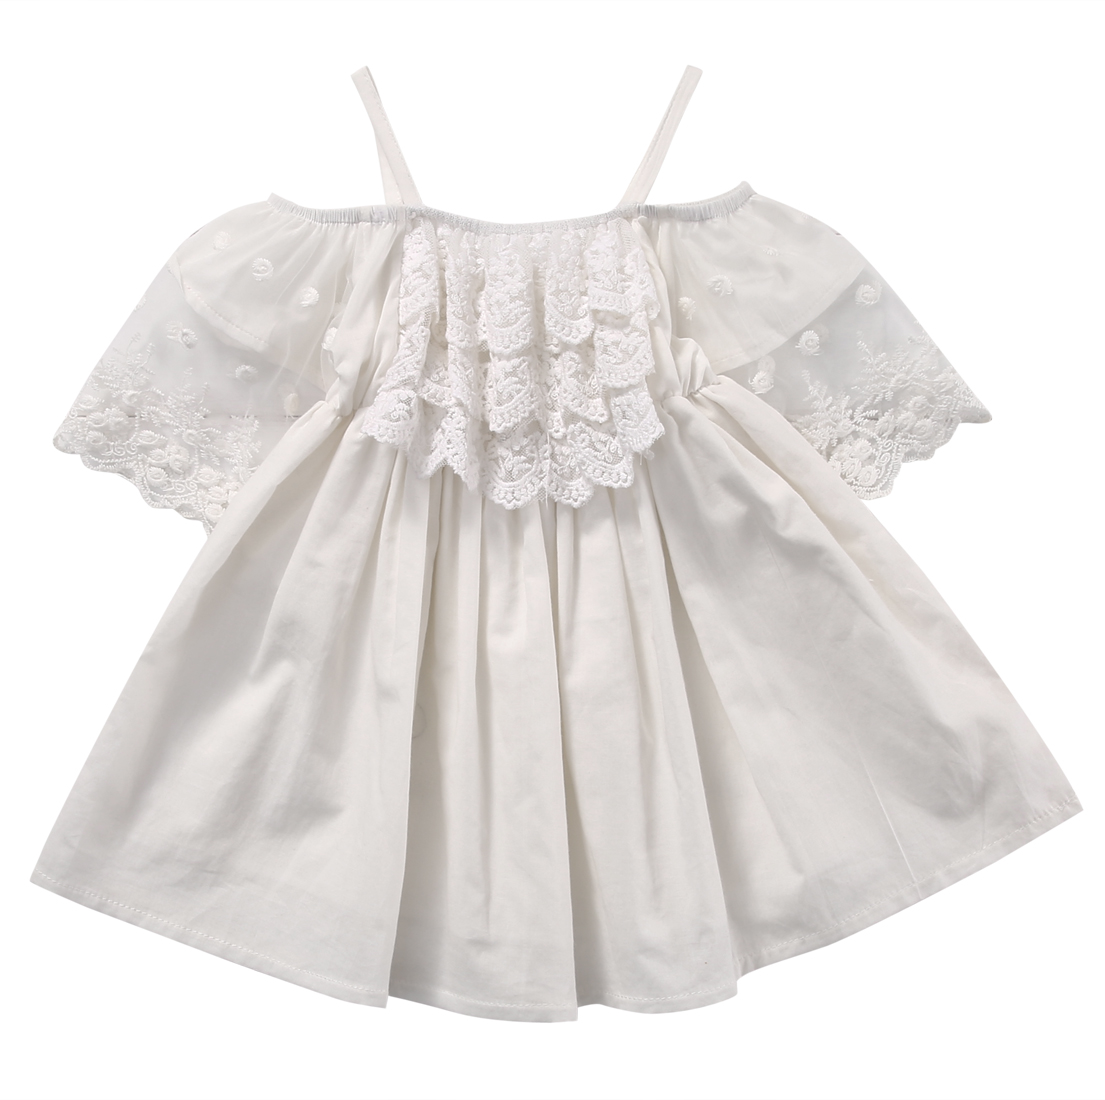 UK Flower Kids Baby Girls Princess Pageant Party Wedding Lace Tutu Dress Clothes